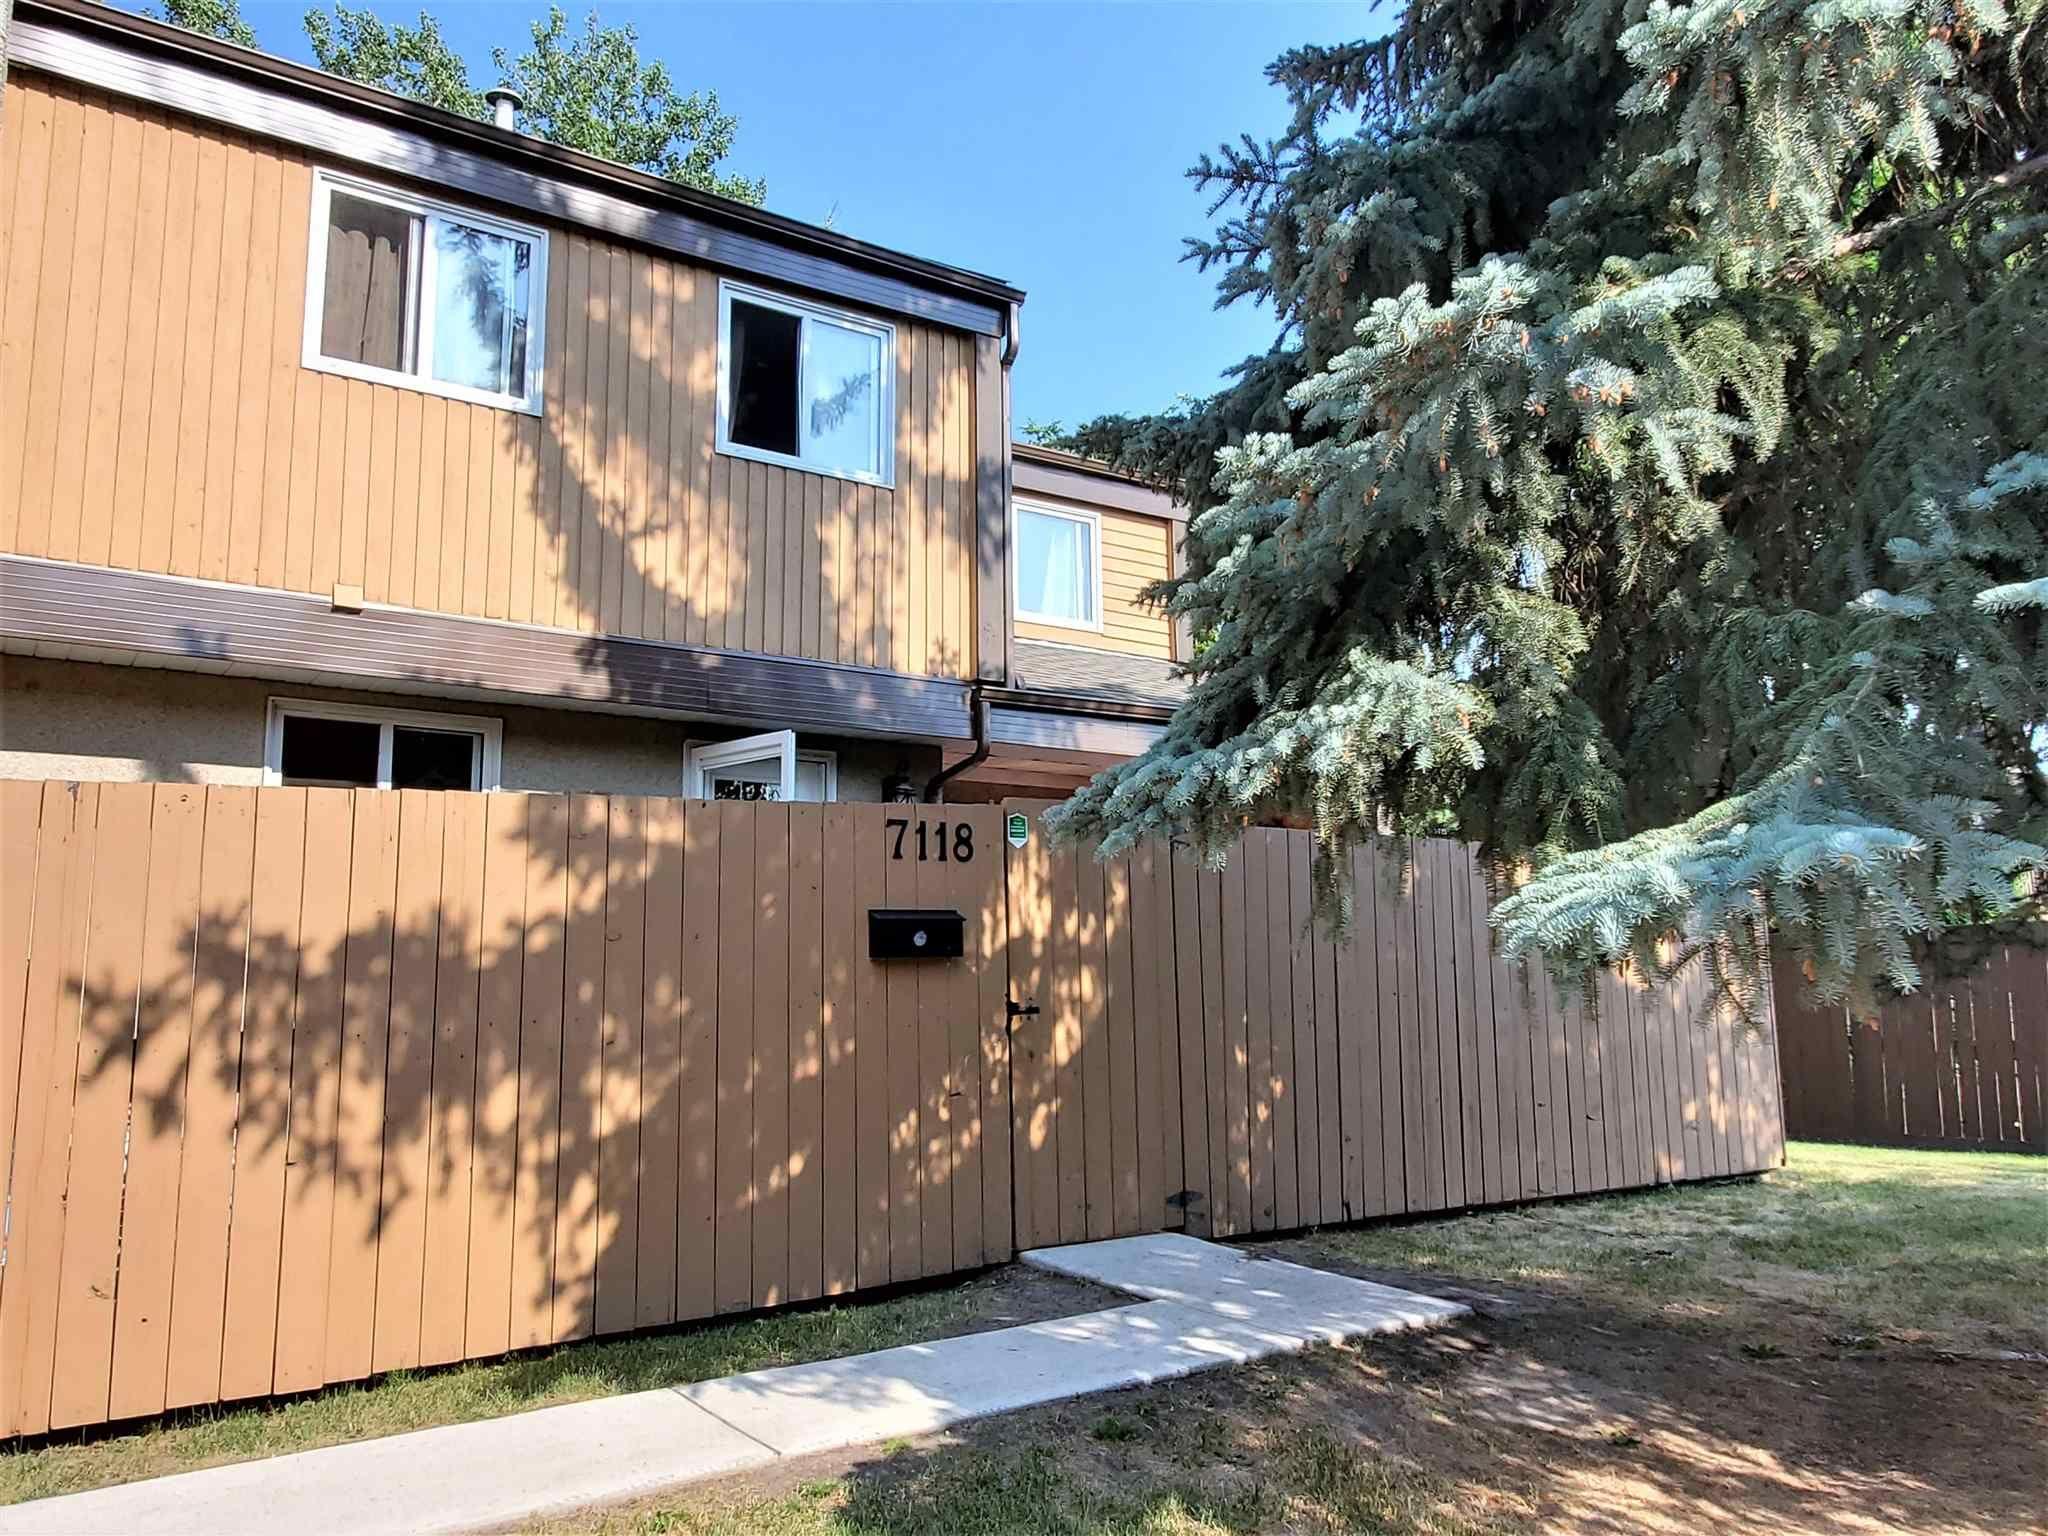 Main Photo: 7118 178 Street in Edmonton: Zone 20 Townhouse for sale : MLS®# E4253890